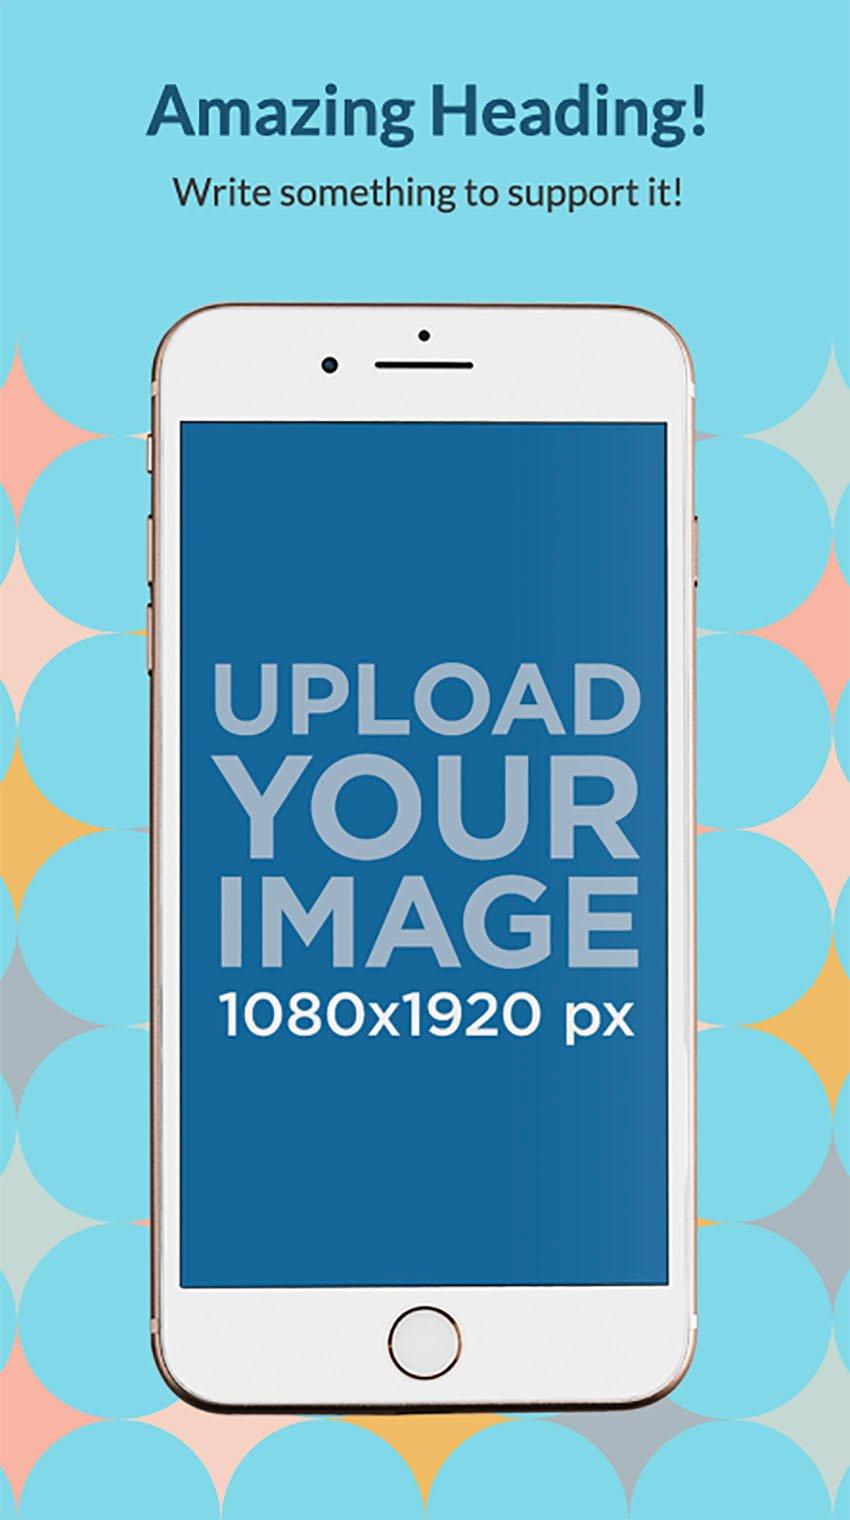 iPhone 8 App Store Screenshot